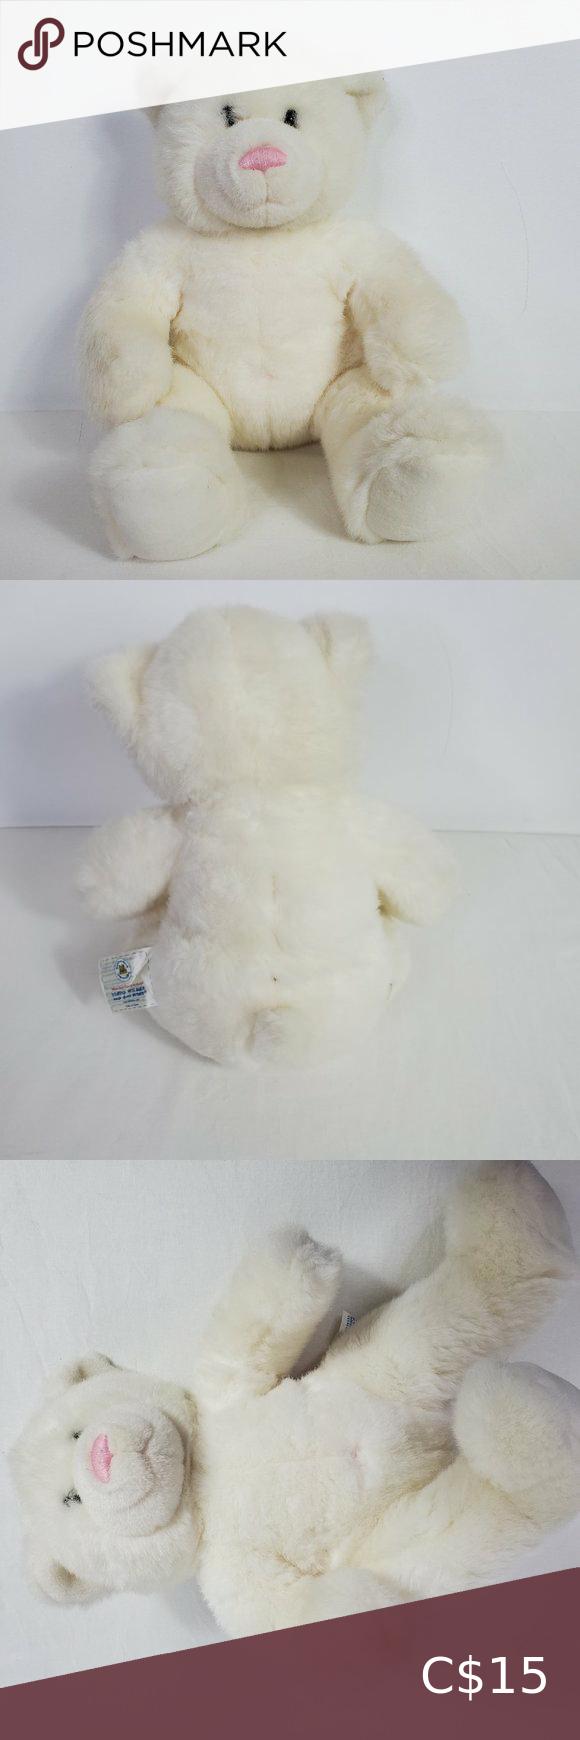 BAB Build A Bear White Teddy Bear Pink Nose Plush